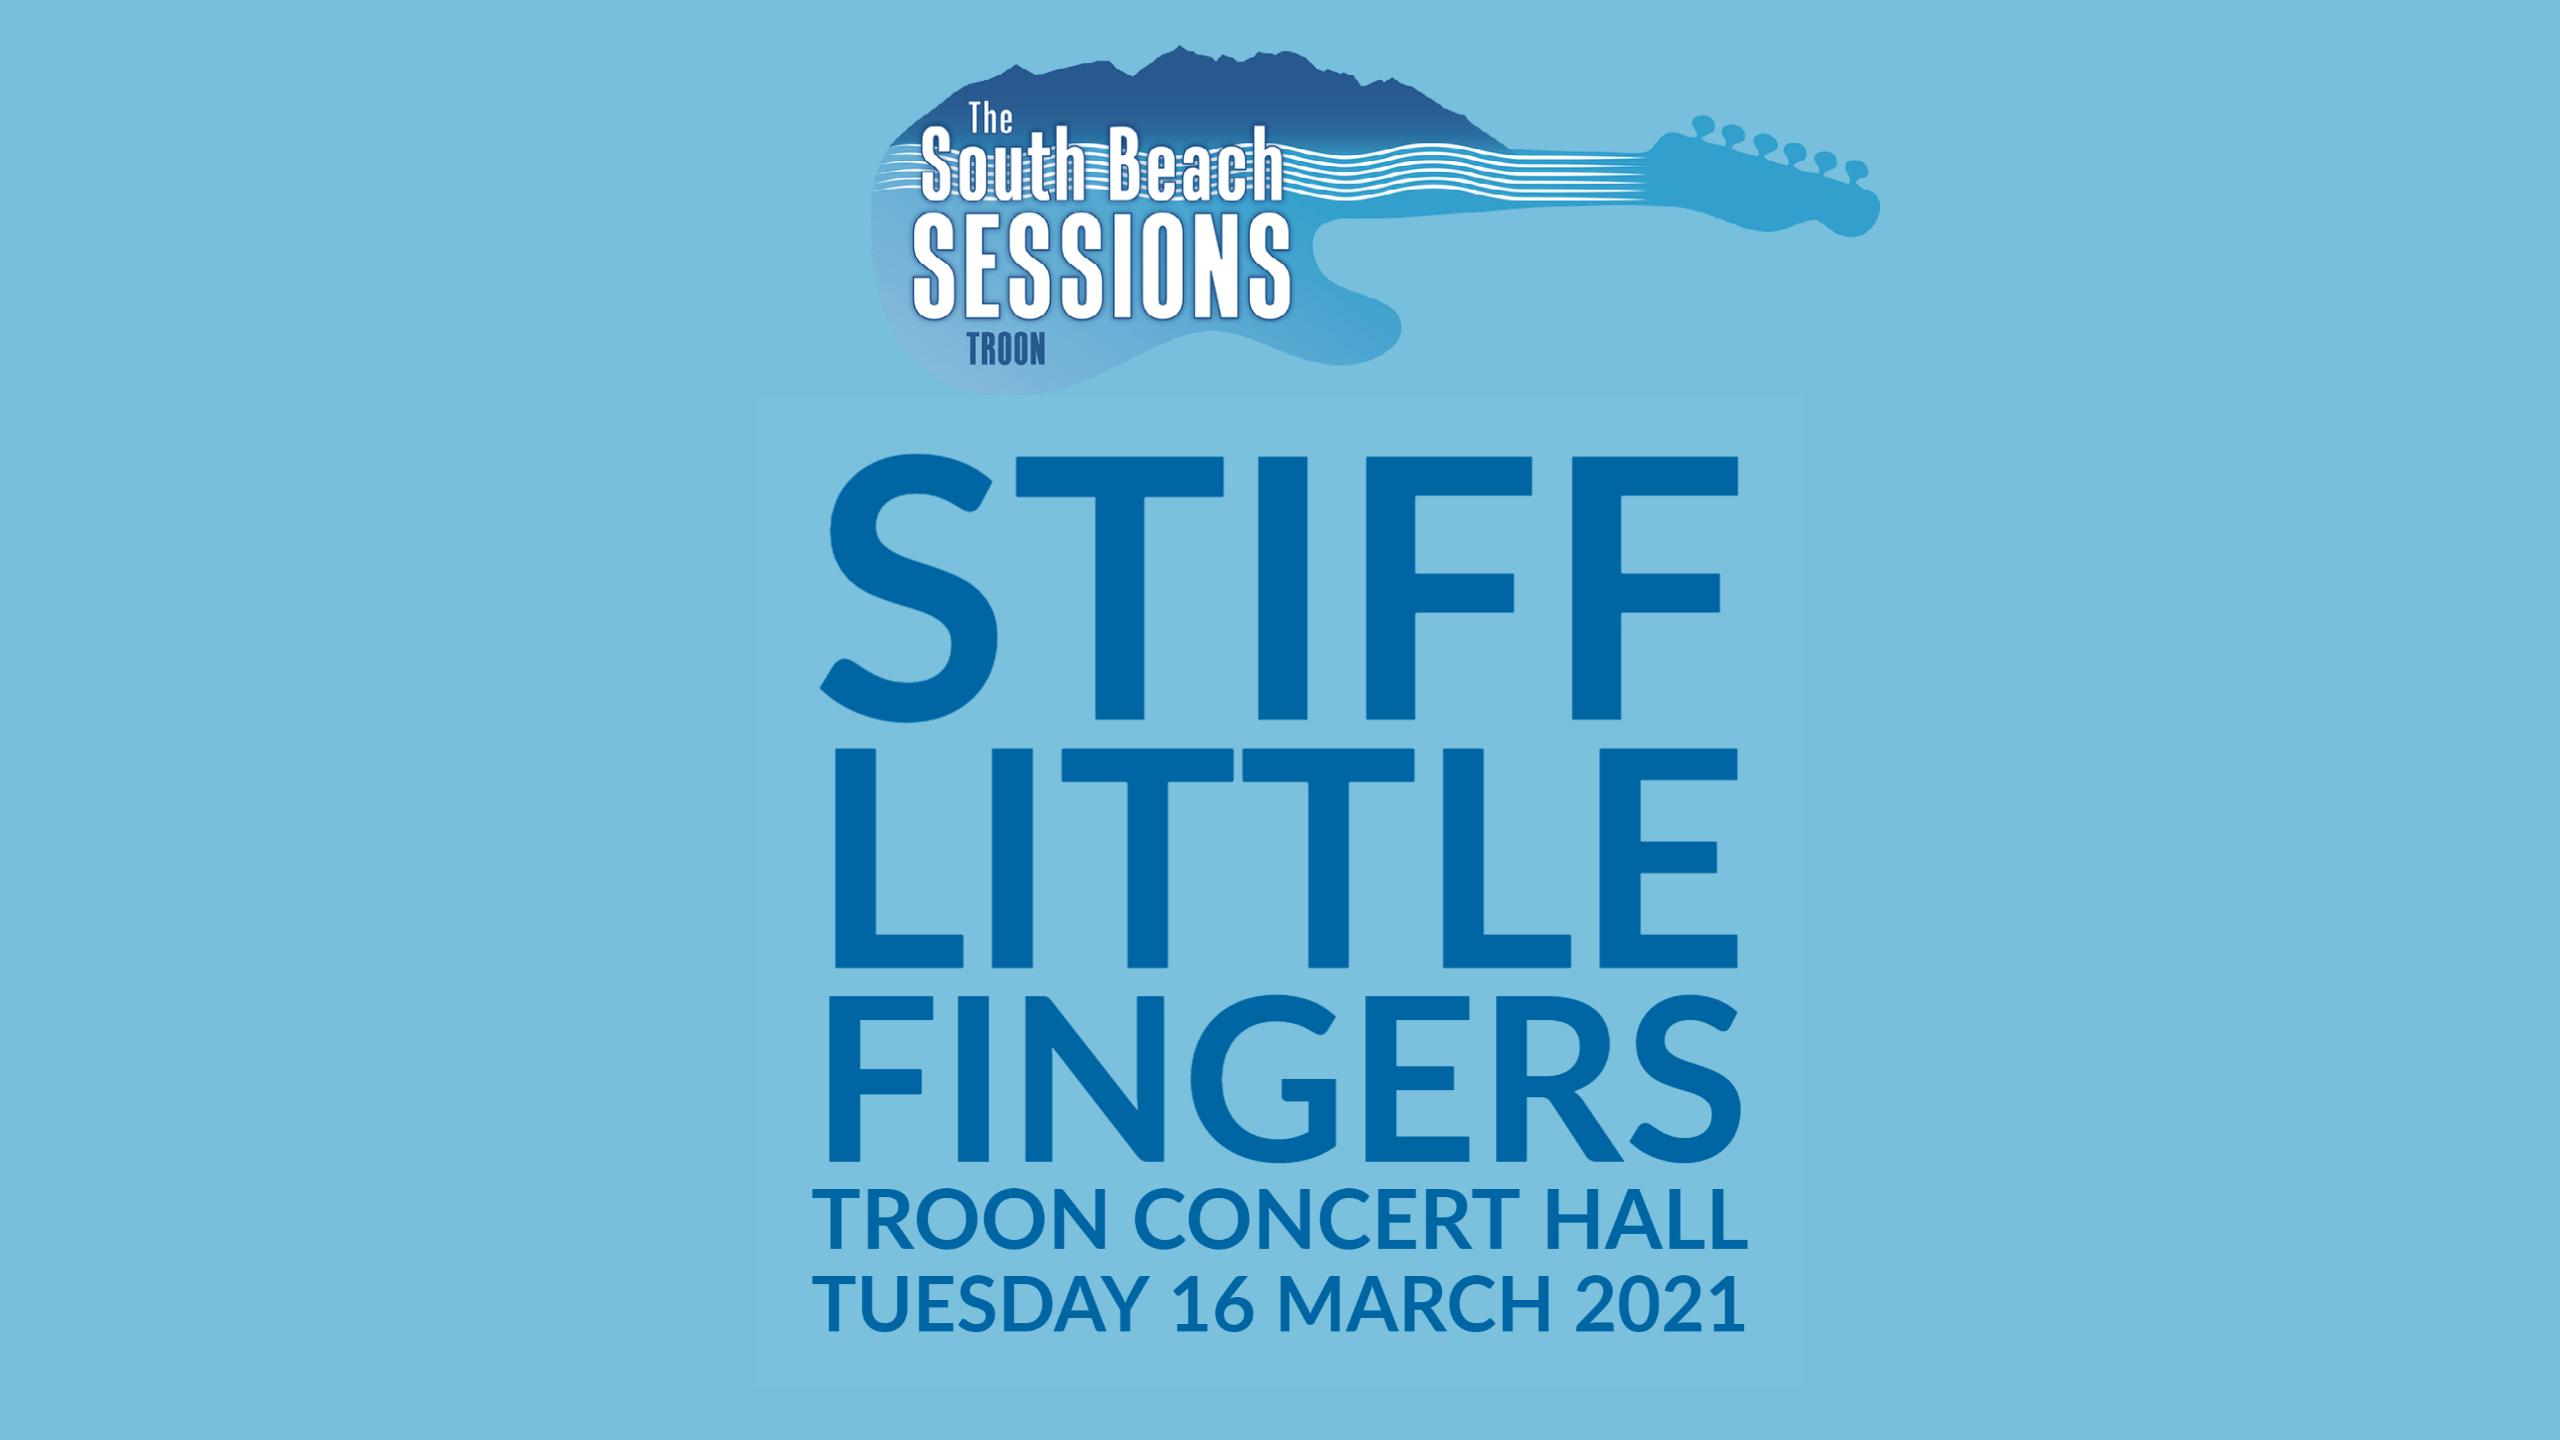 Sessions - Stiff Little Fingers